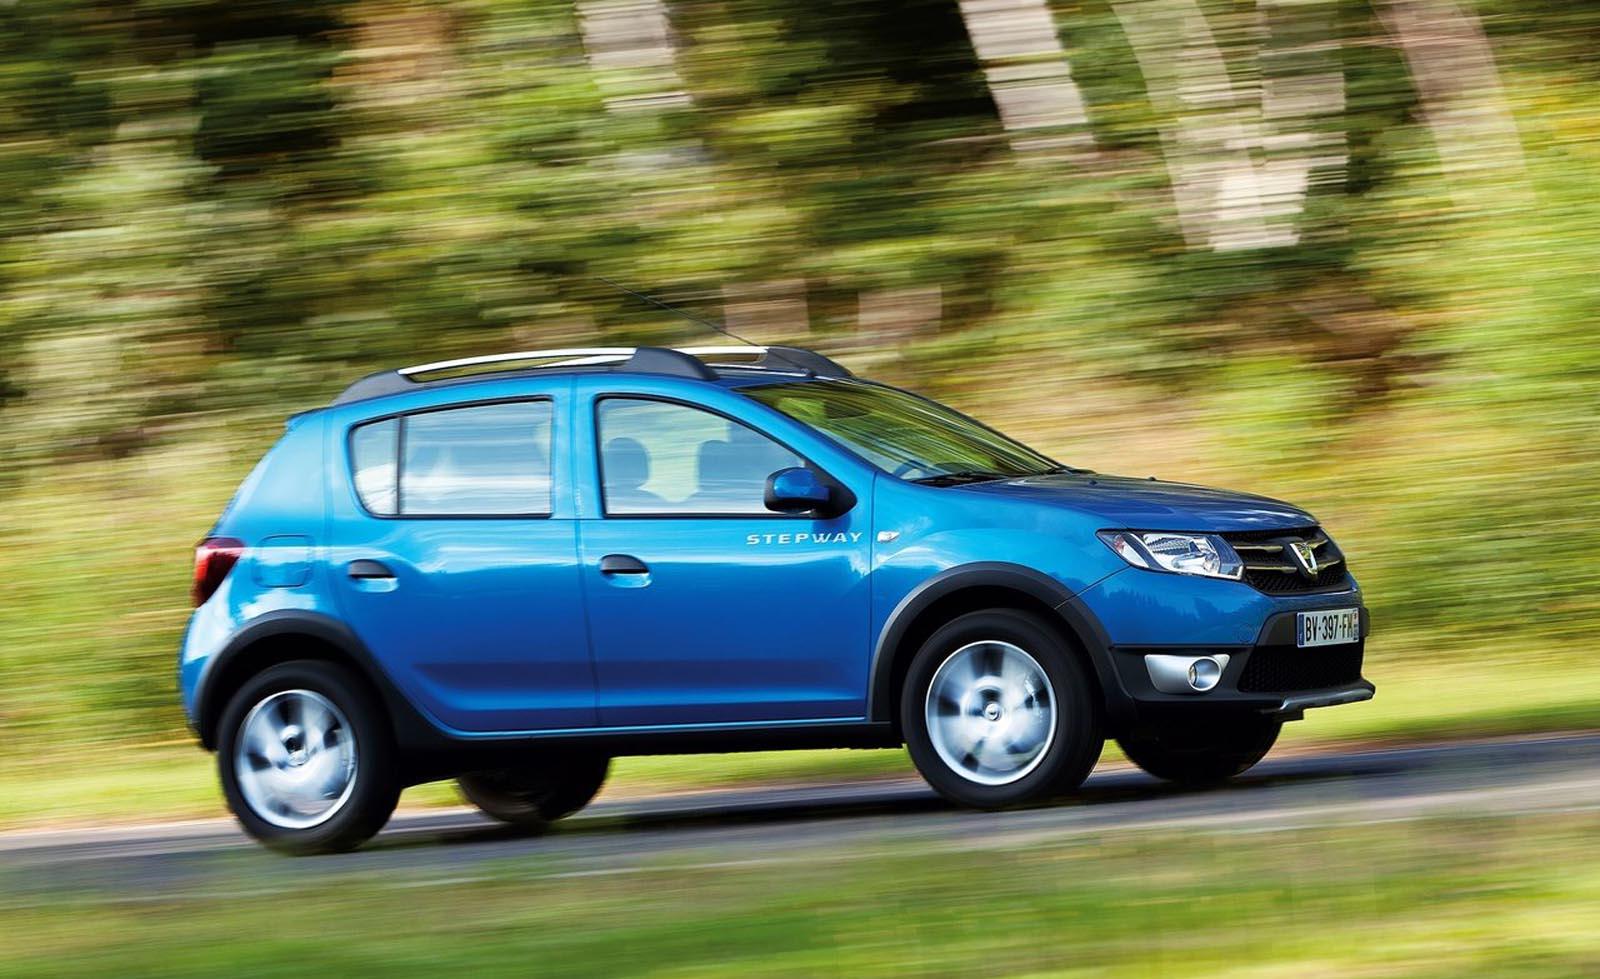 Photo of Tα επόμενα Dacia θα έχουν το σασί του νέου Renault Clio!